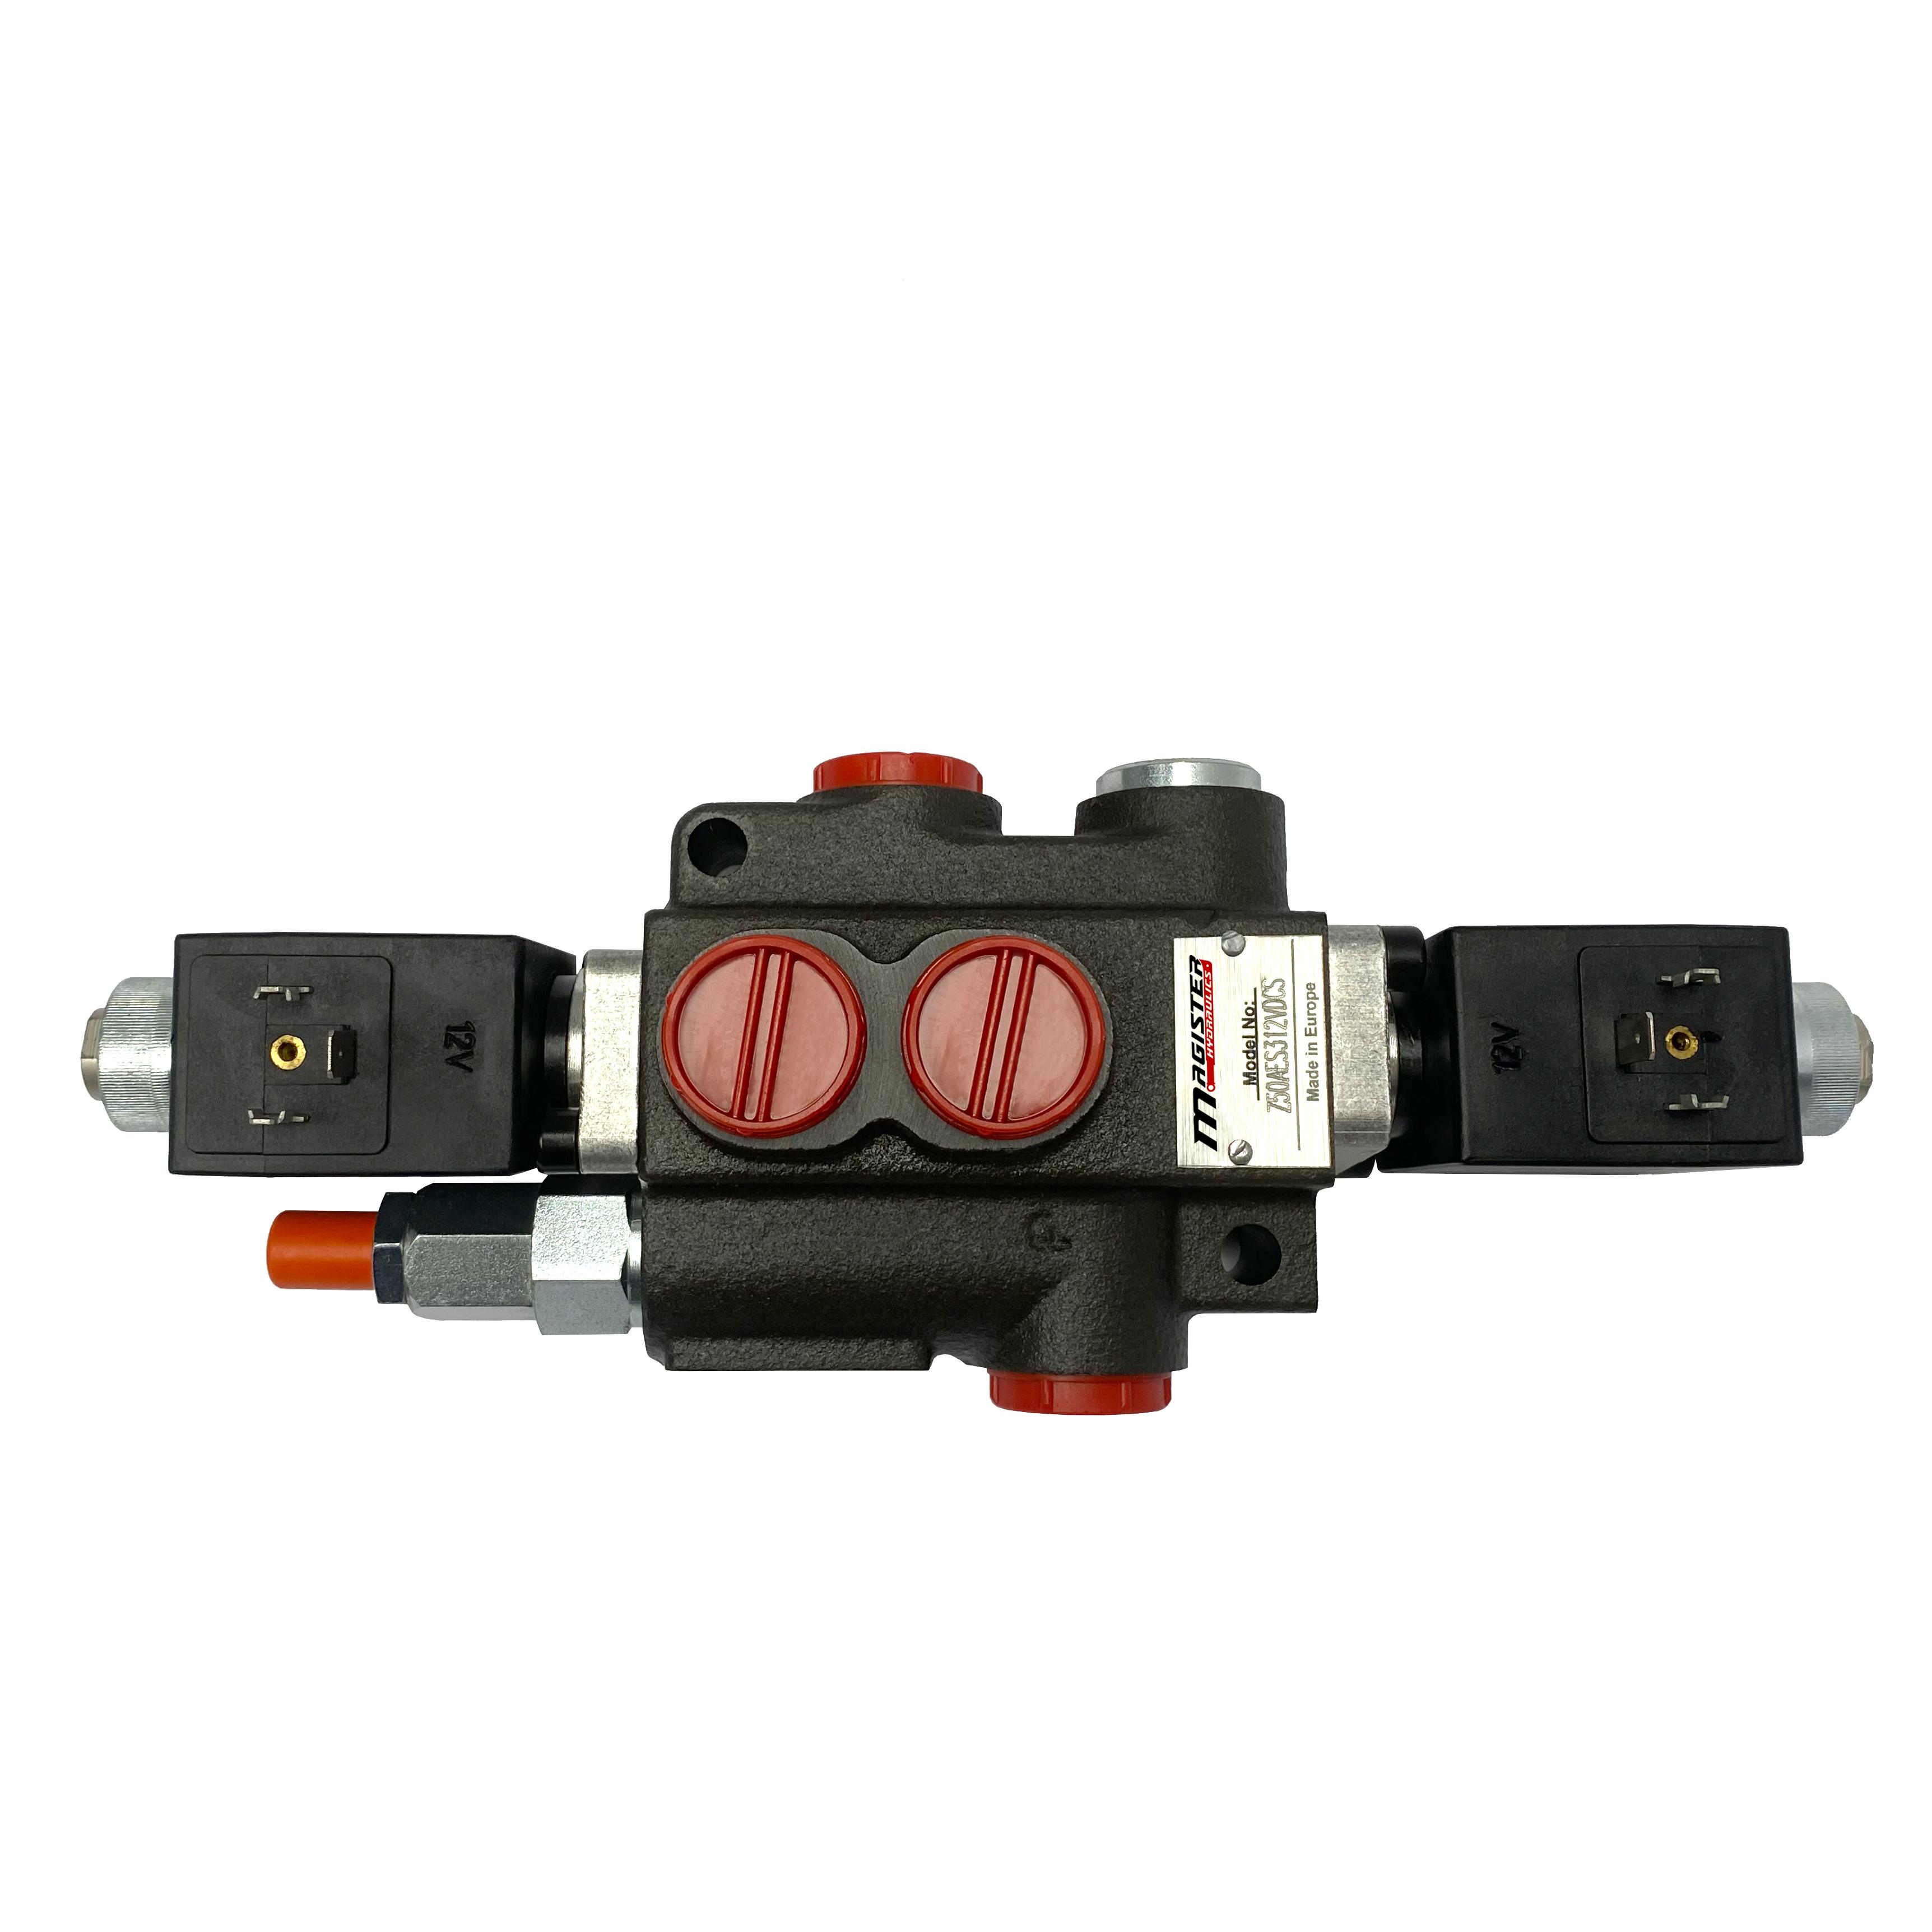 1 spool x 13 GPM solenoid hydraulic control valve, monoblock cast iron valve   Magister Hydraulics